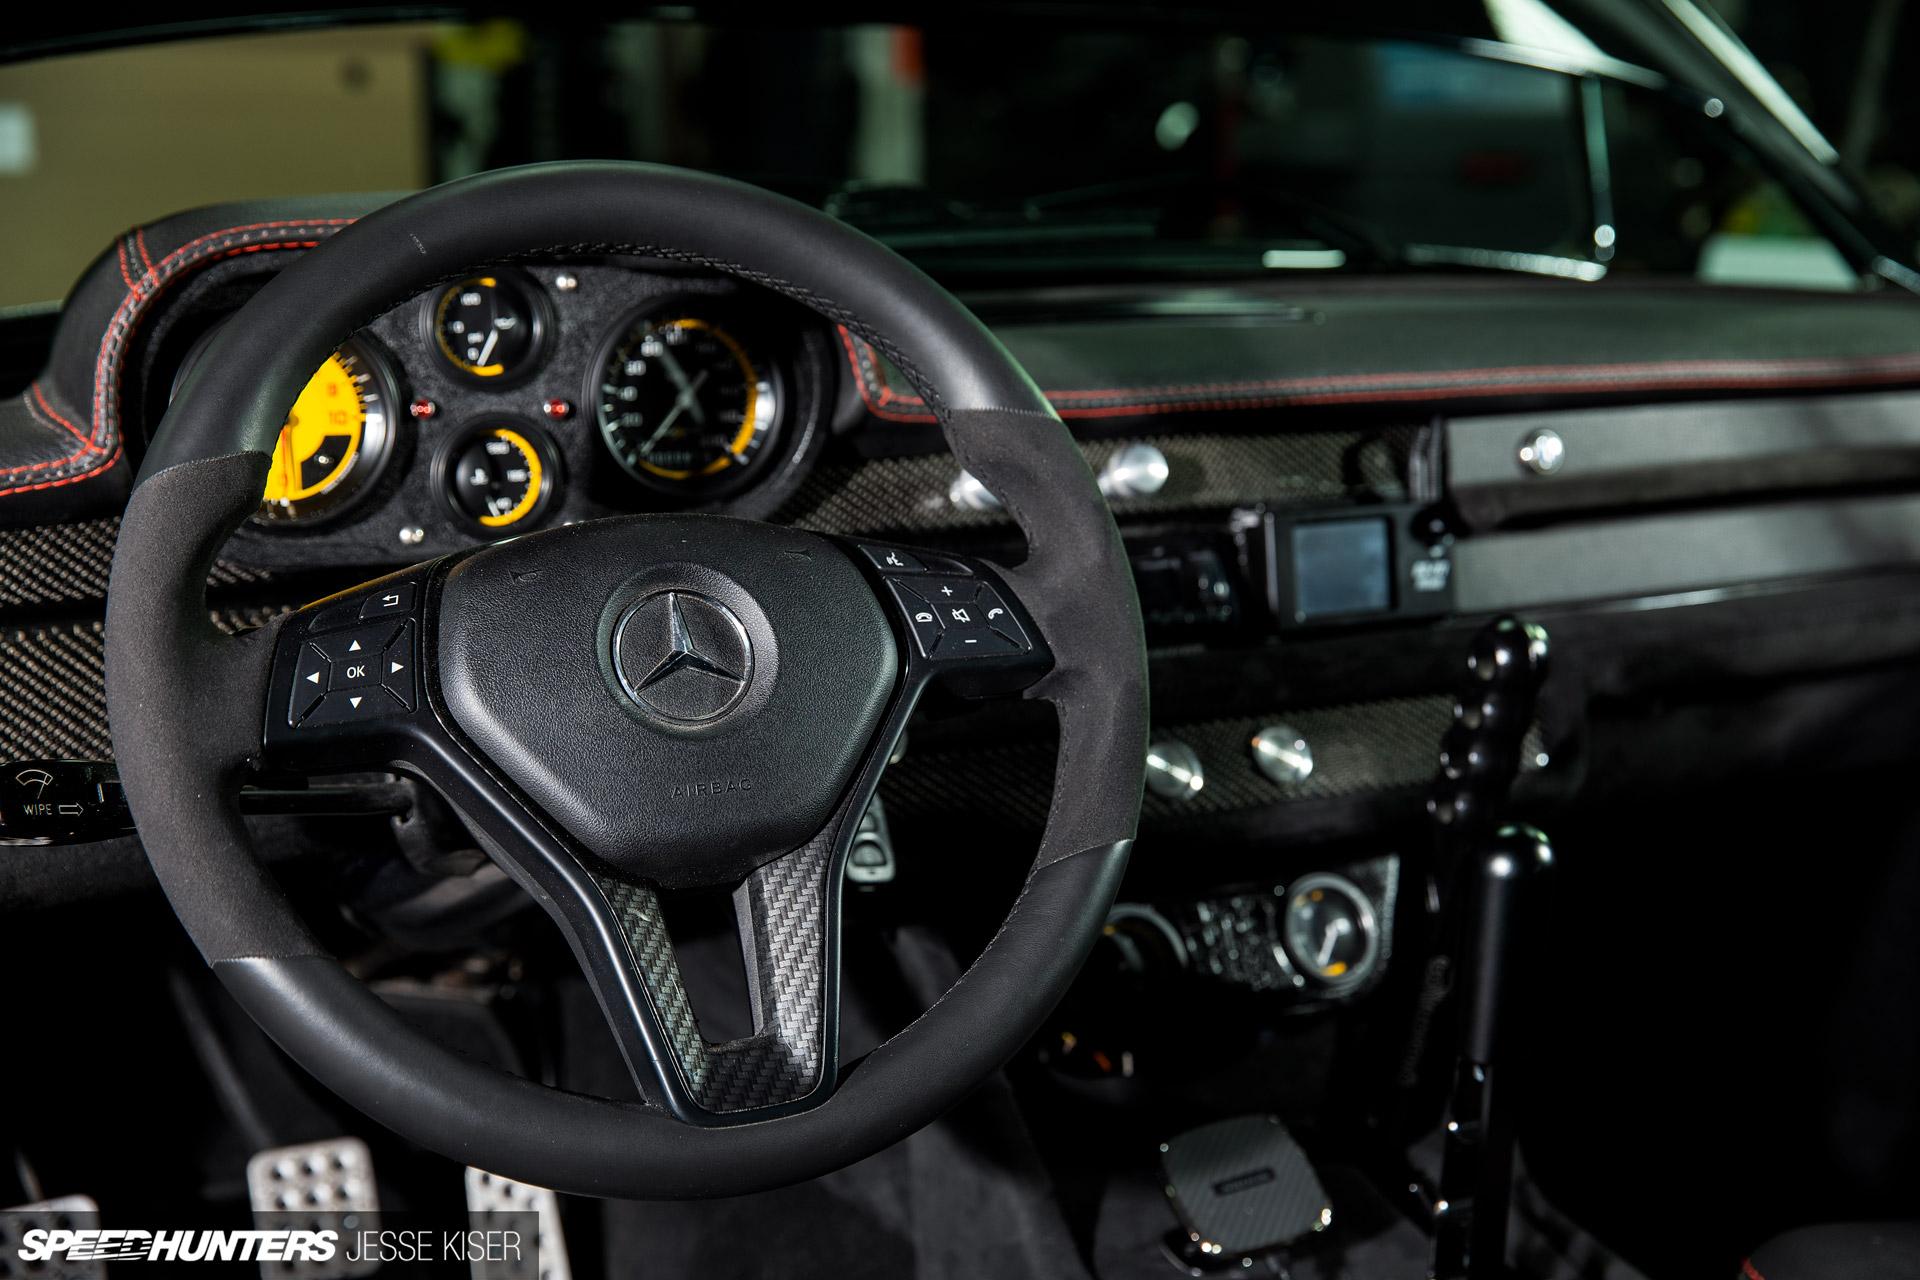 Eurowise's Long & Low Mercedes-Benz Hot Rod - Motor Sport HQ